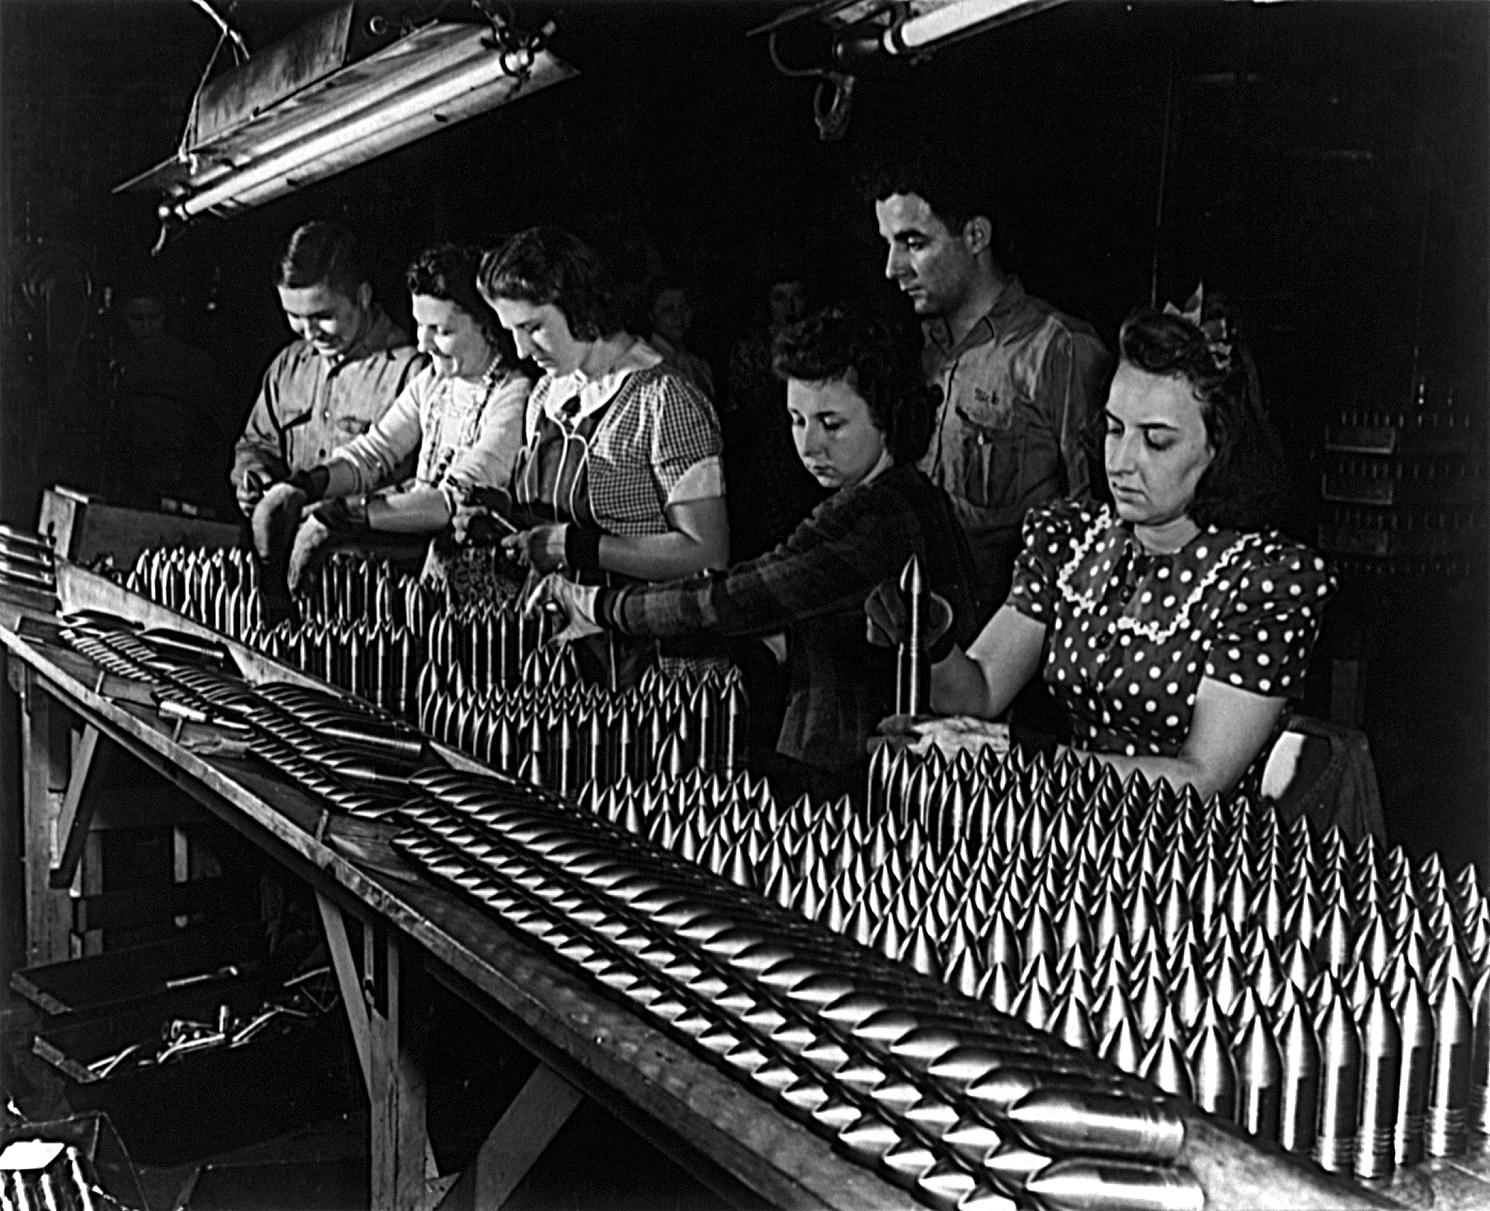 team building Mayo luce fabbrica